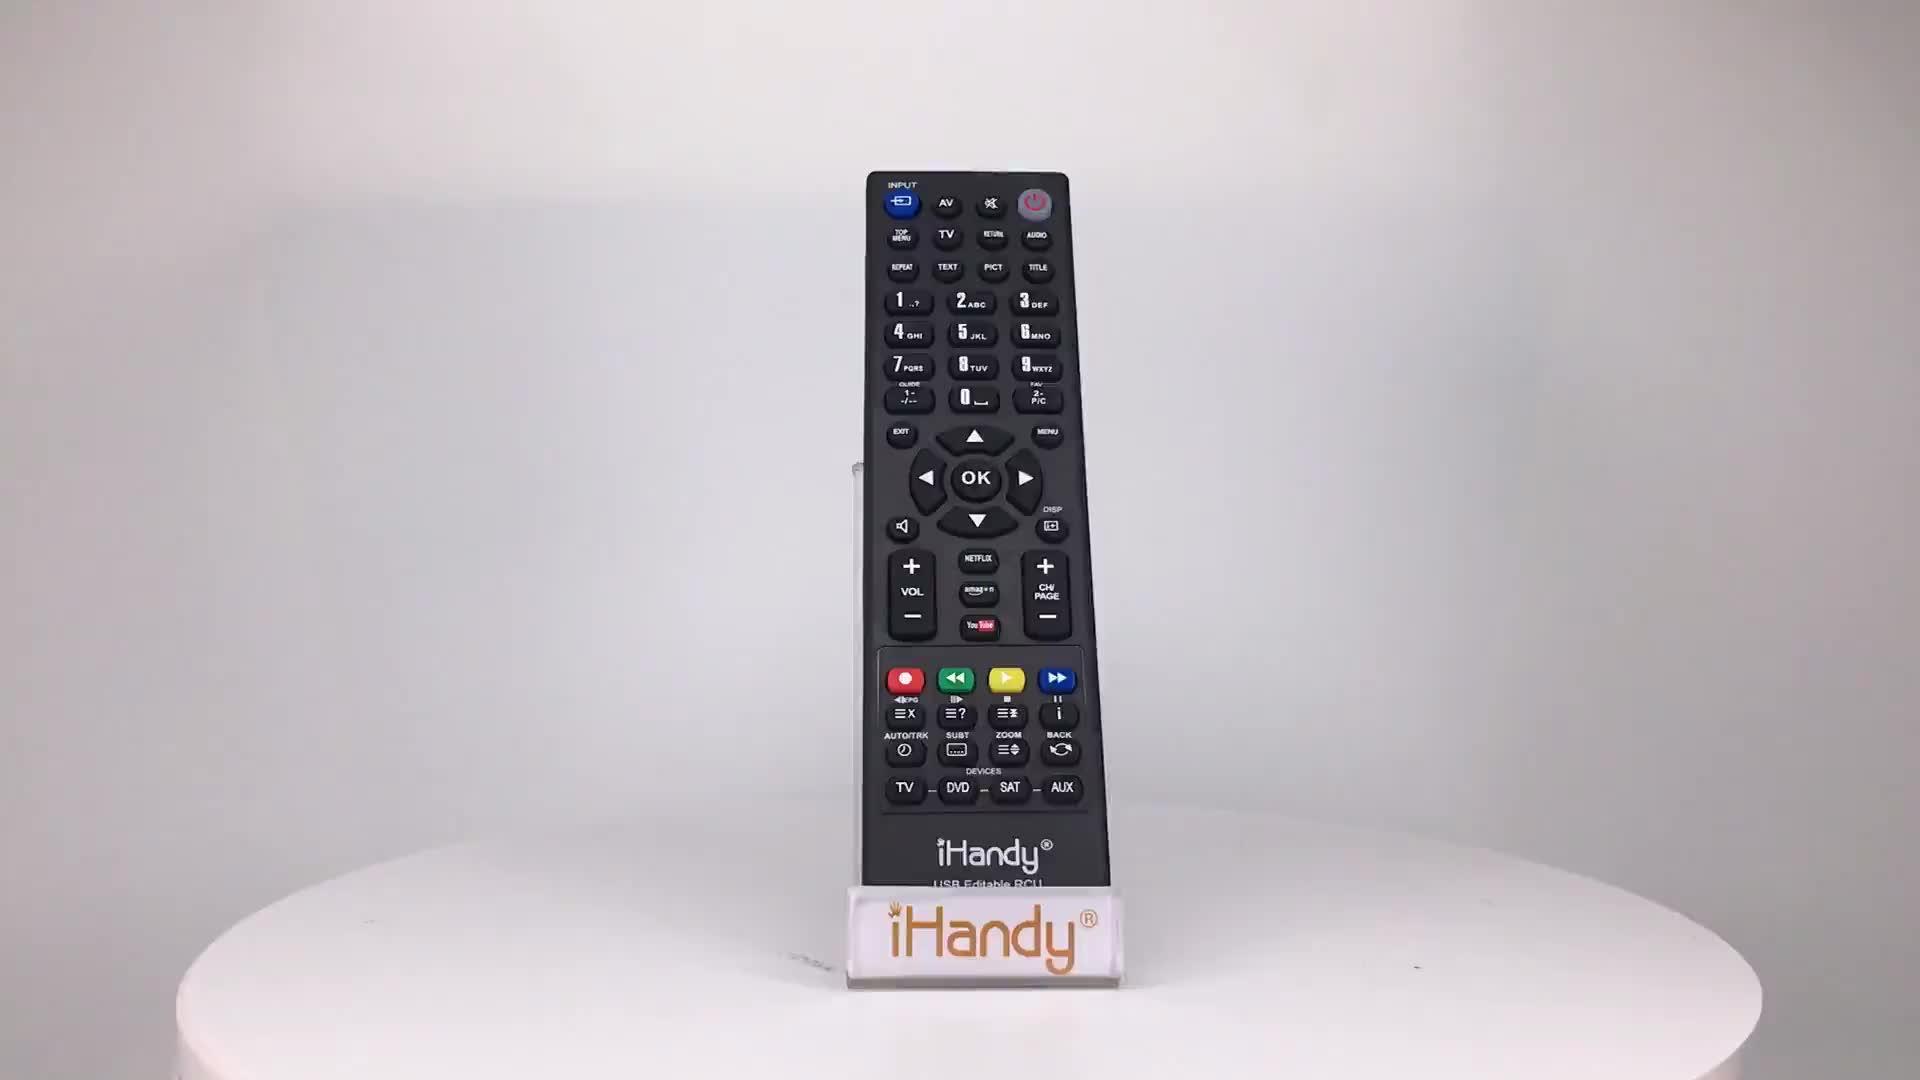 SYSTO iHandy USB 편집 4:1 원격 적합 forTV DVD SAT AUX 학습 USB 프로그래밍 가능 원격